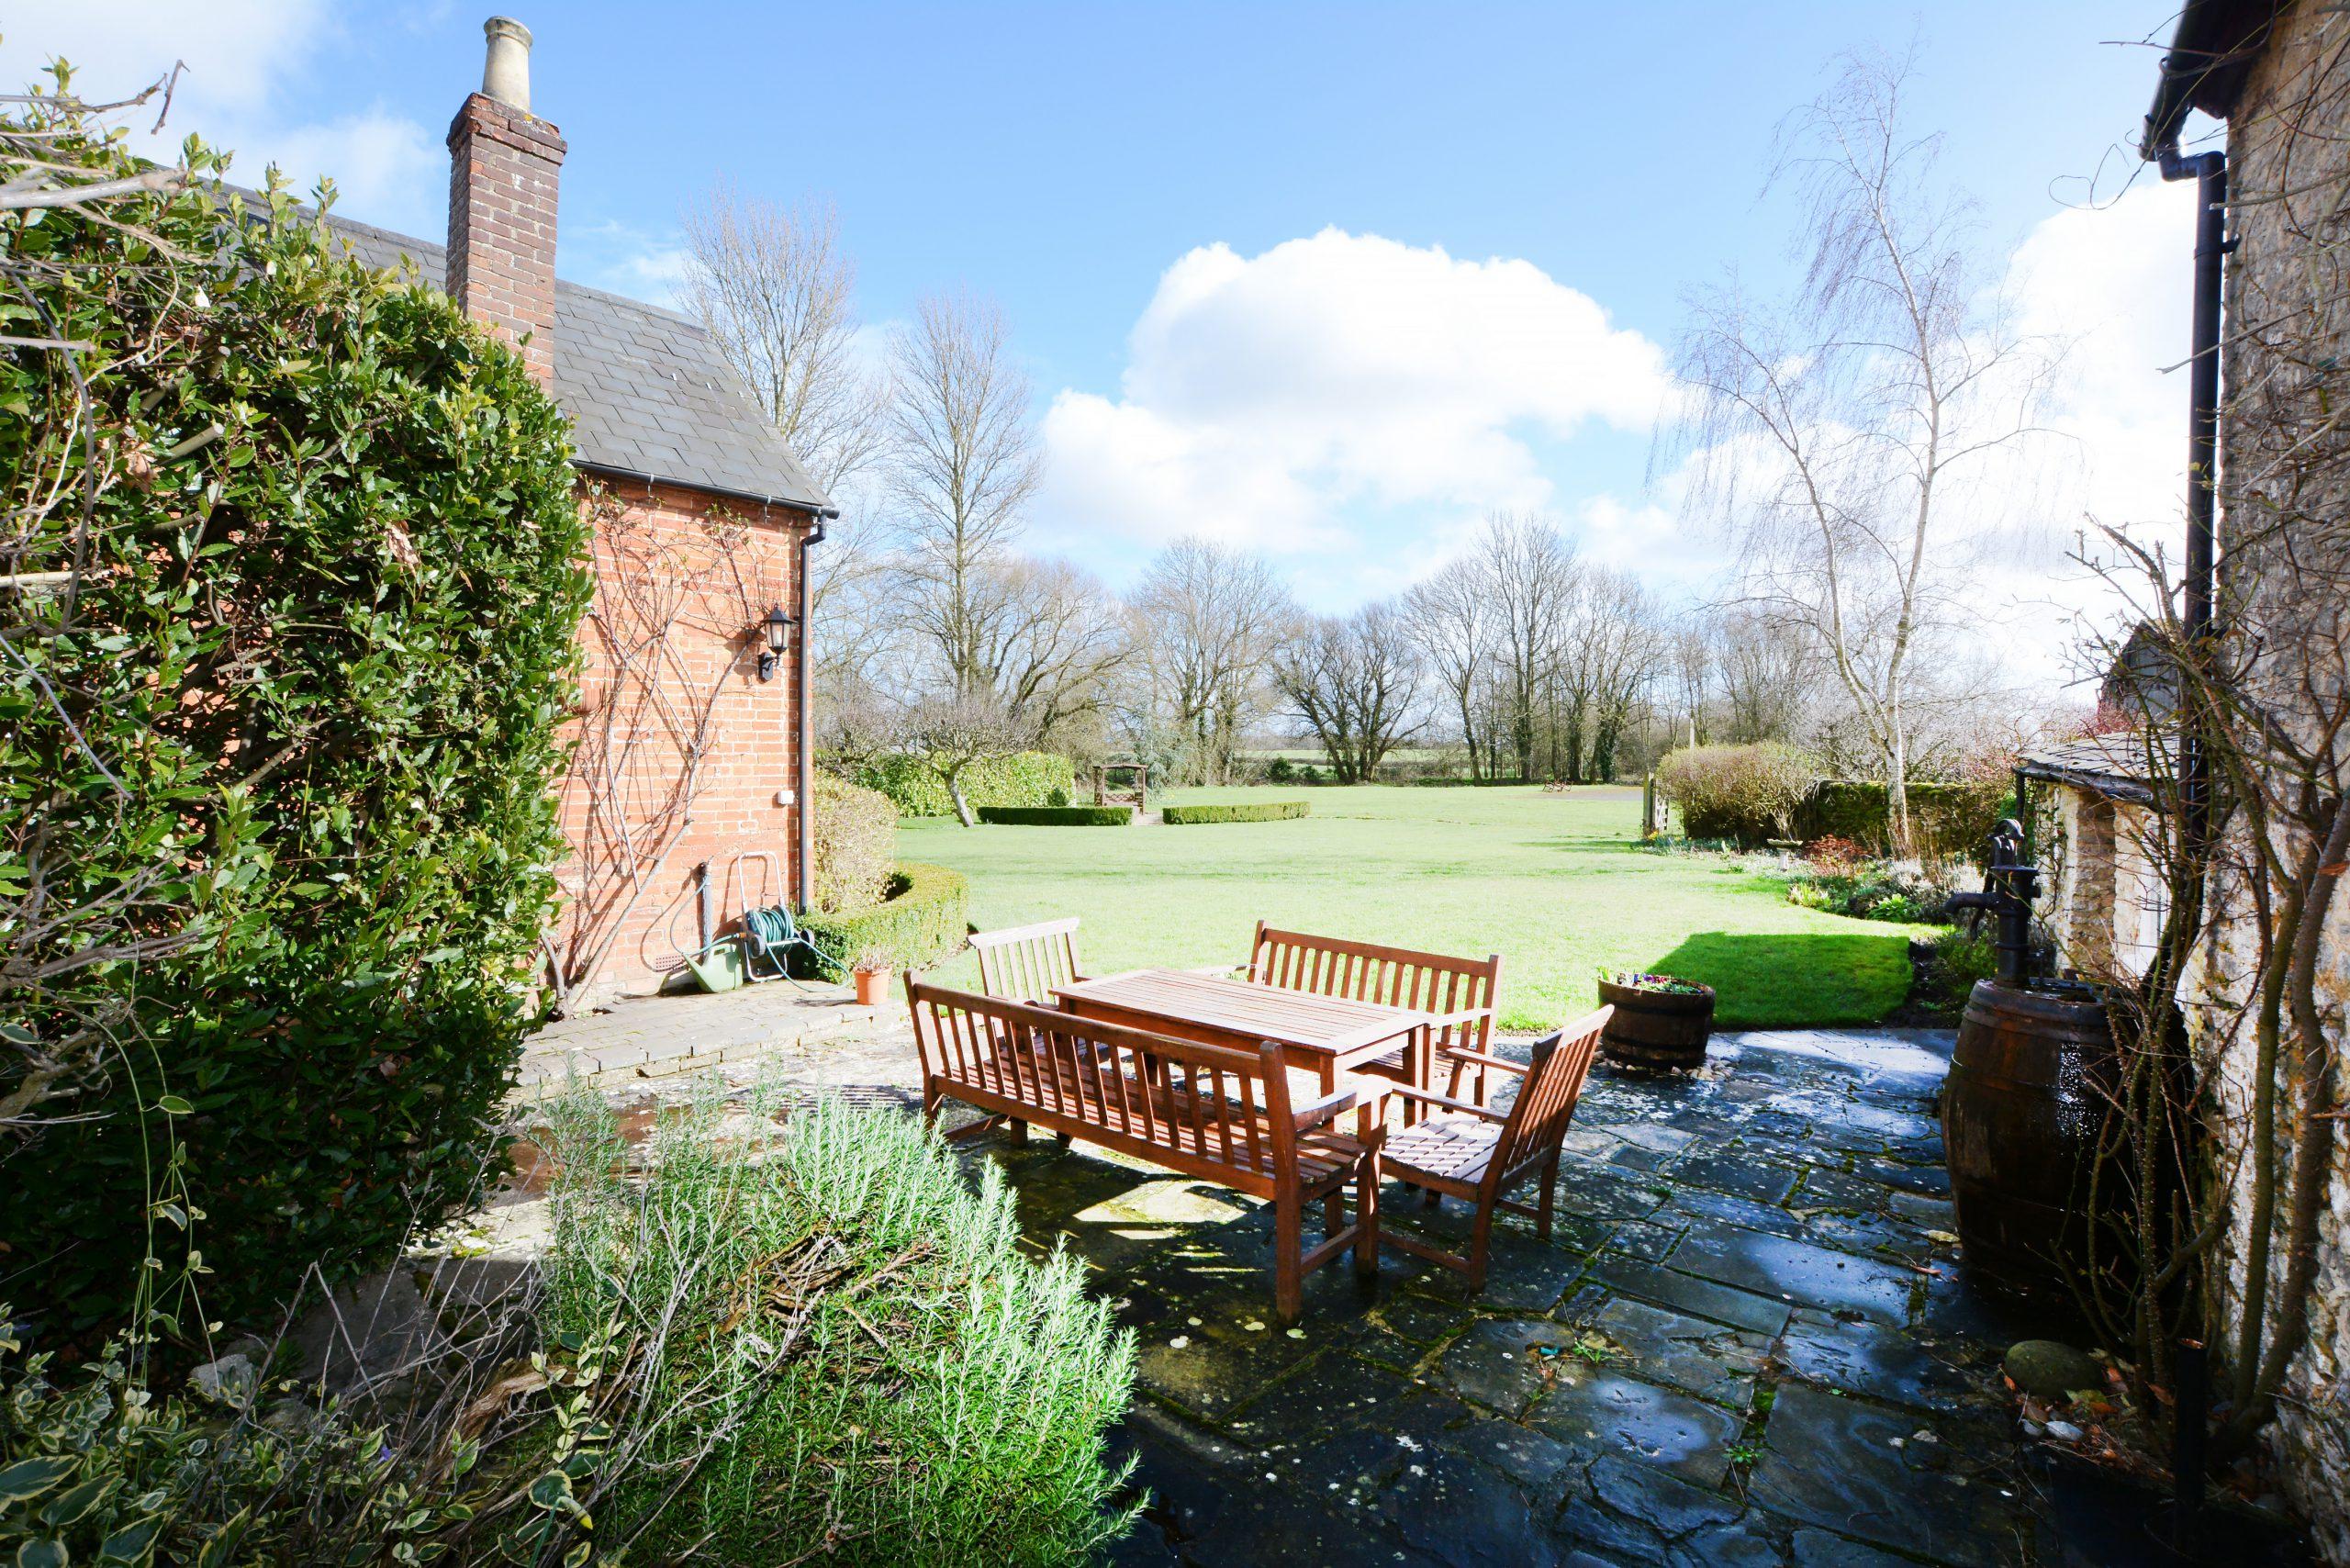 The Old School Bed and Breakfast Garden